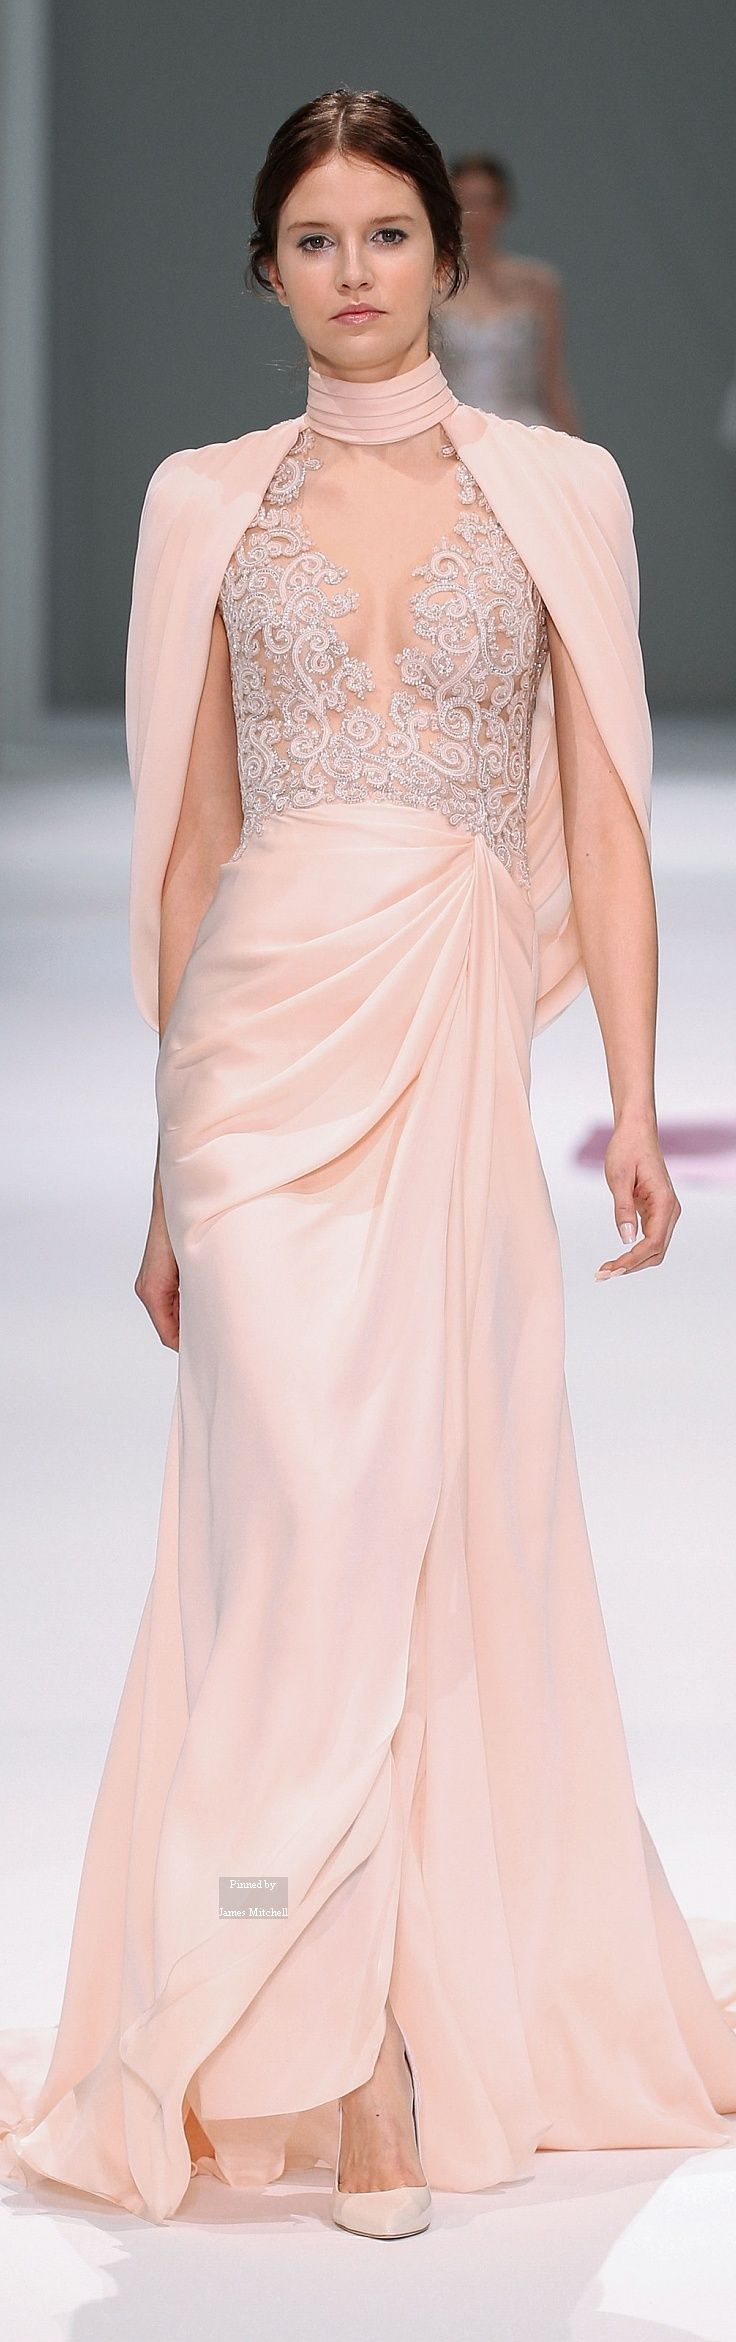 670 best Wedding - Fashion and Details images on Pinterest | Brides ...